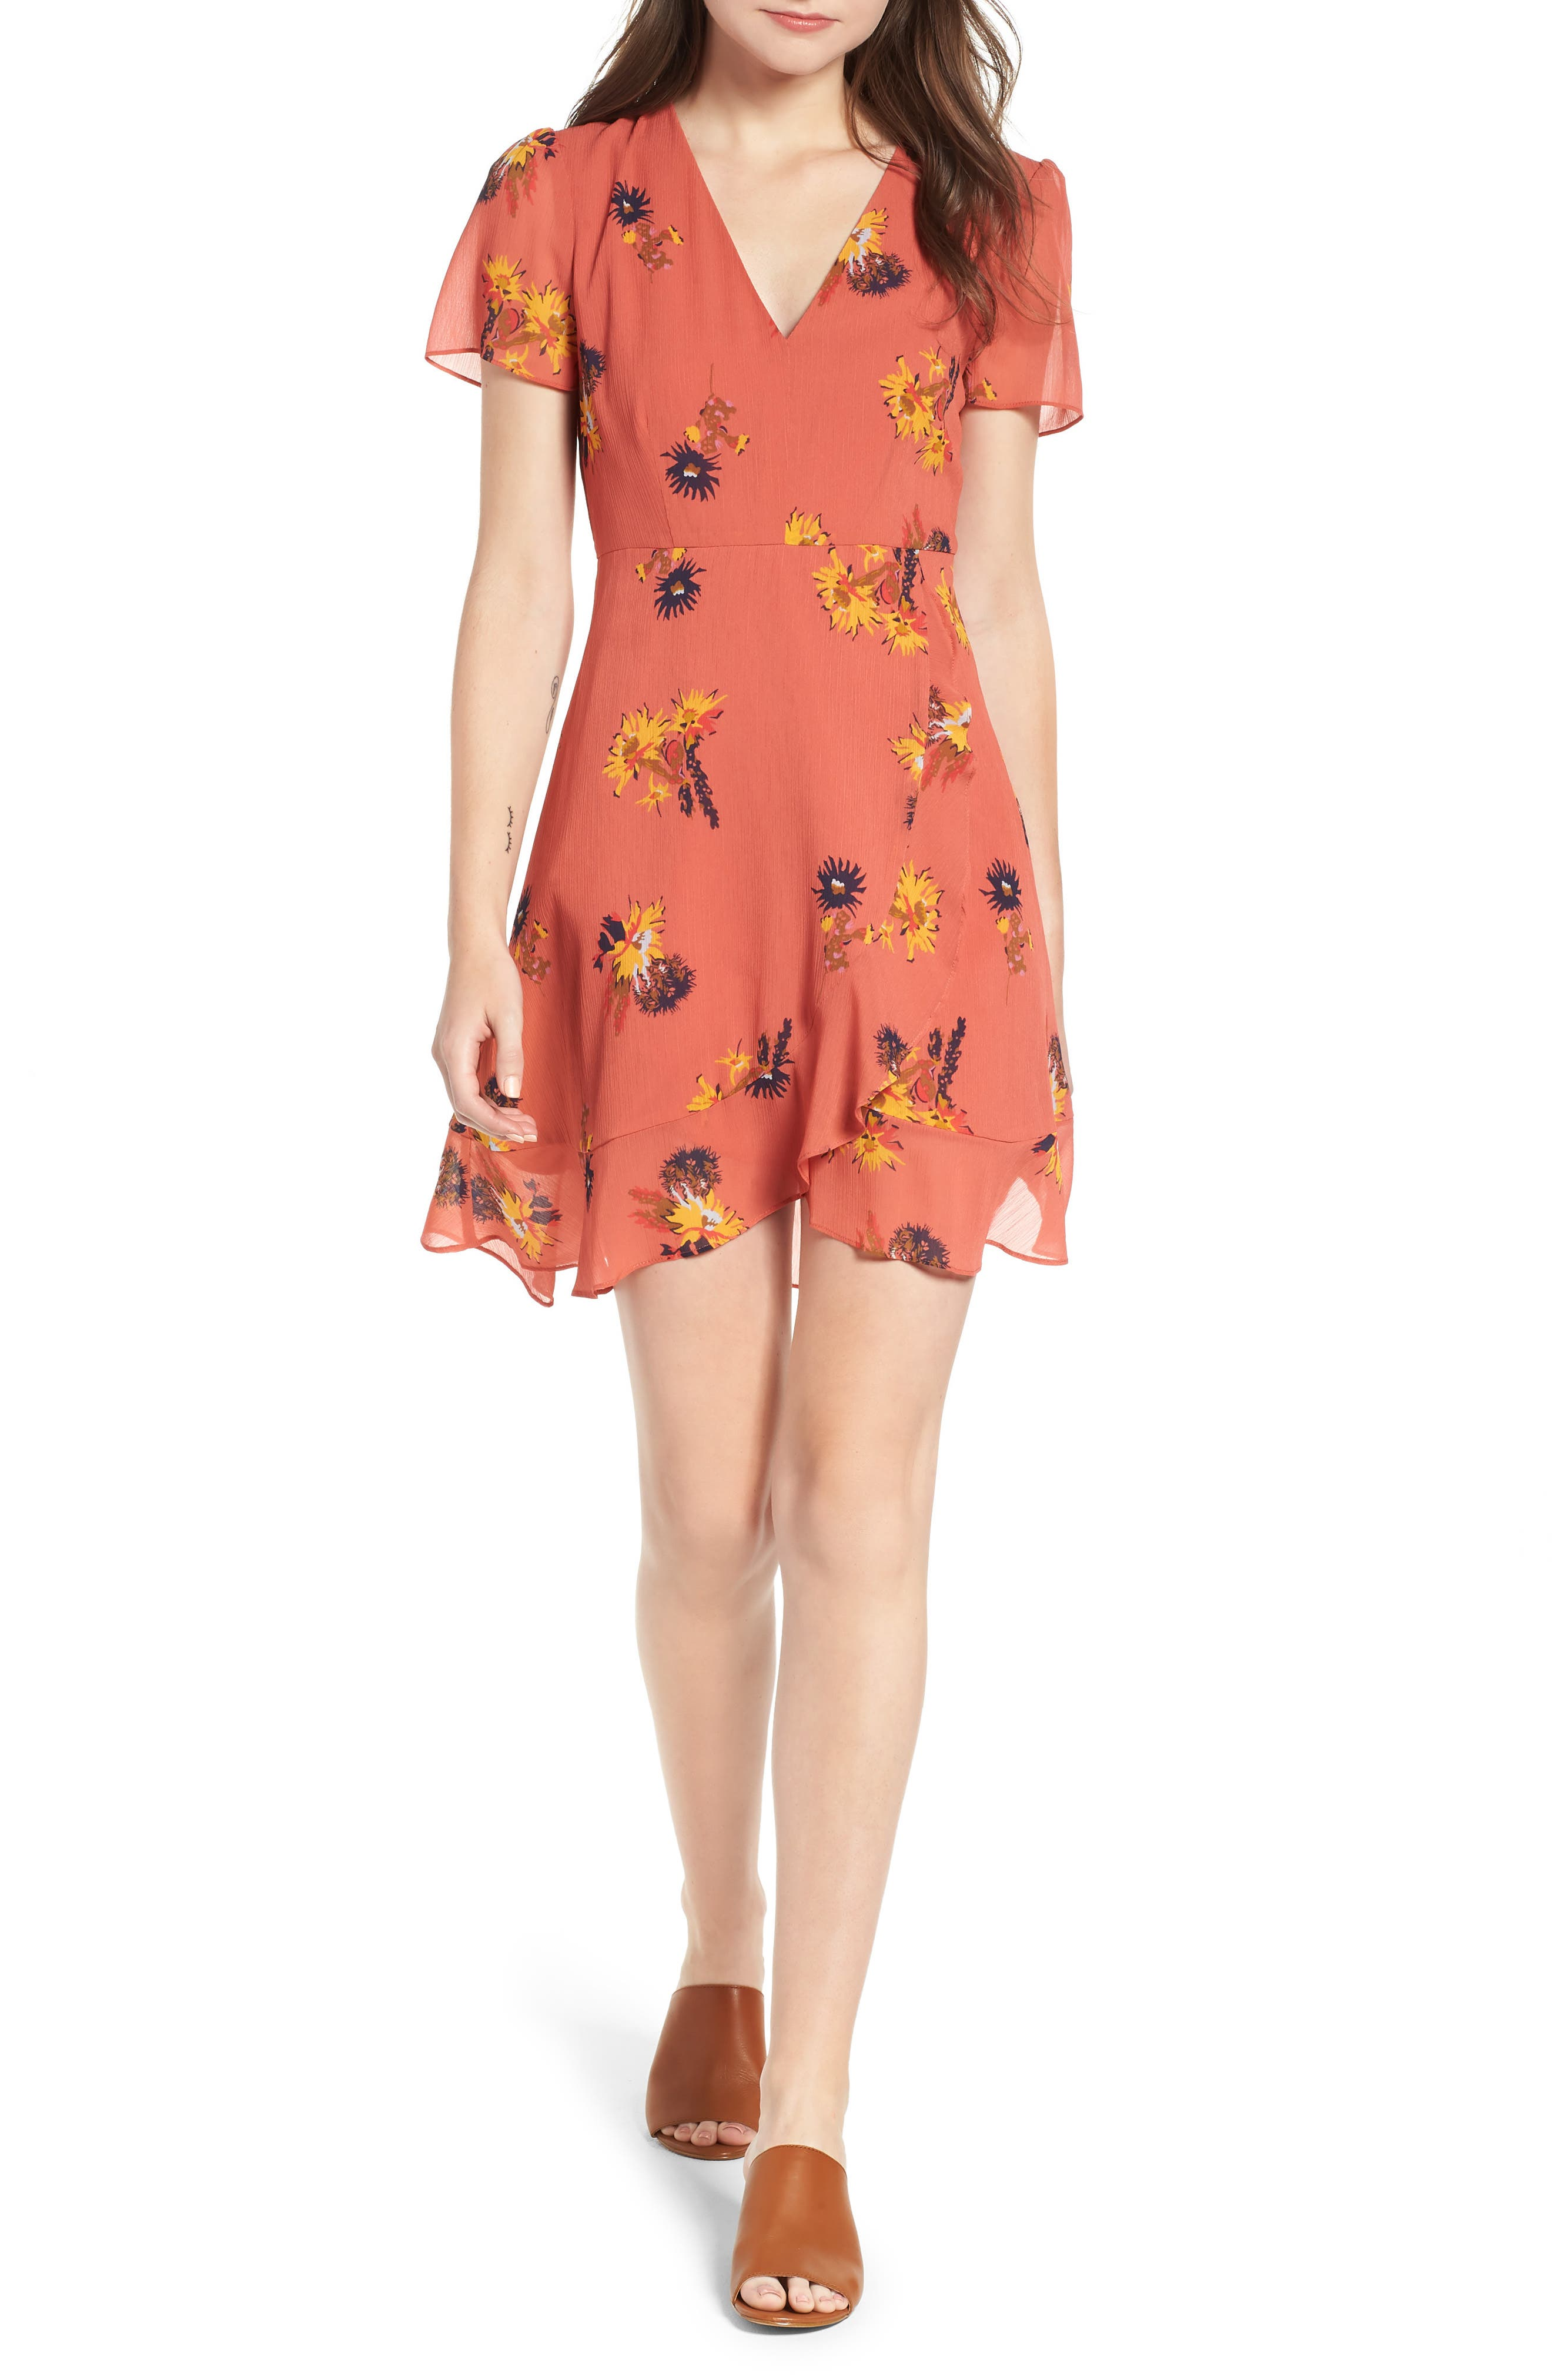 POSY CACTUS FLOWER DRESS